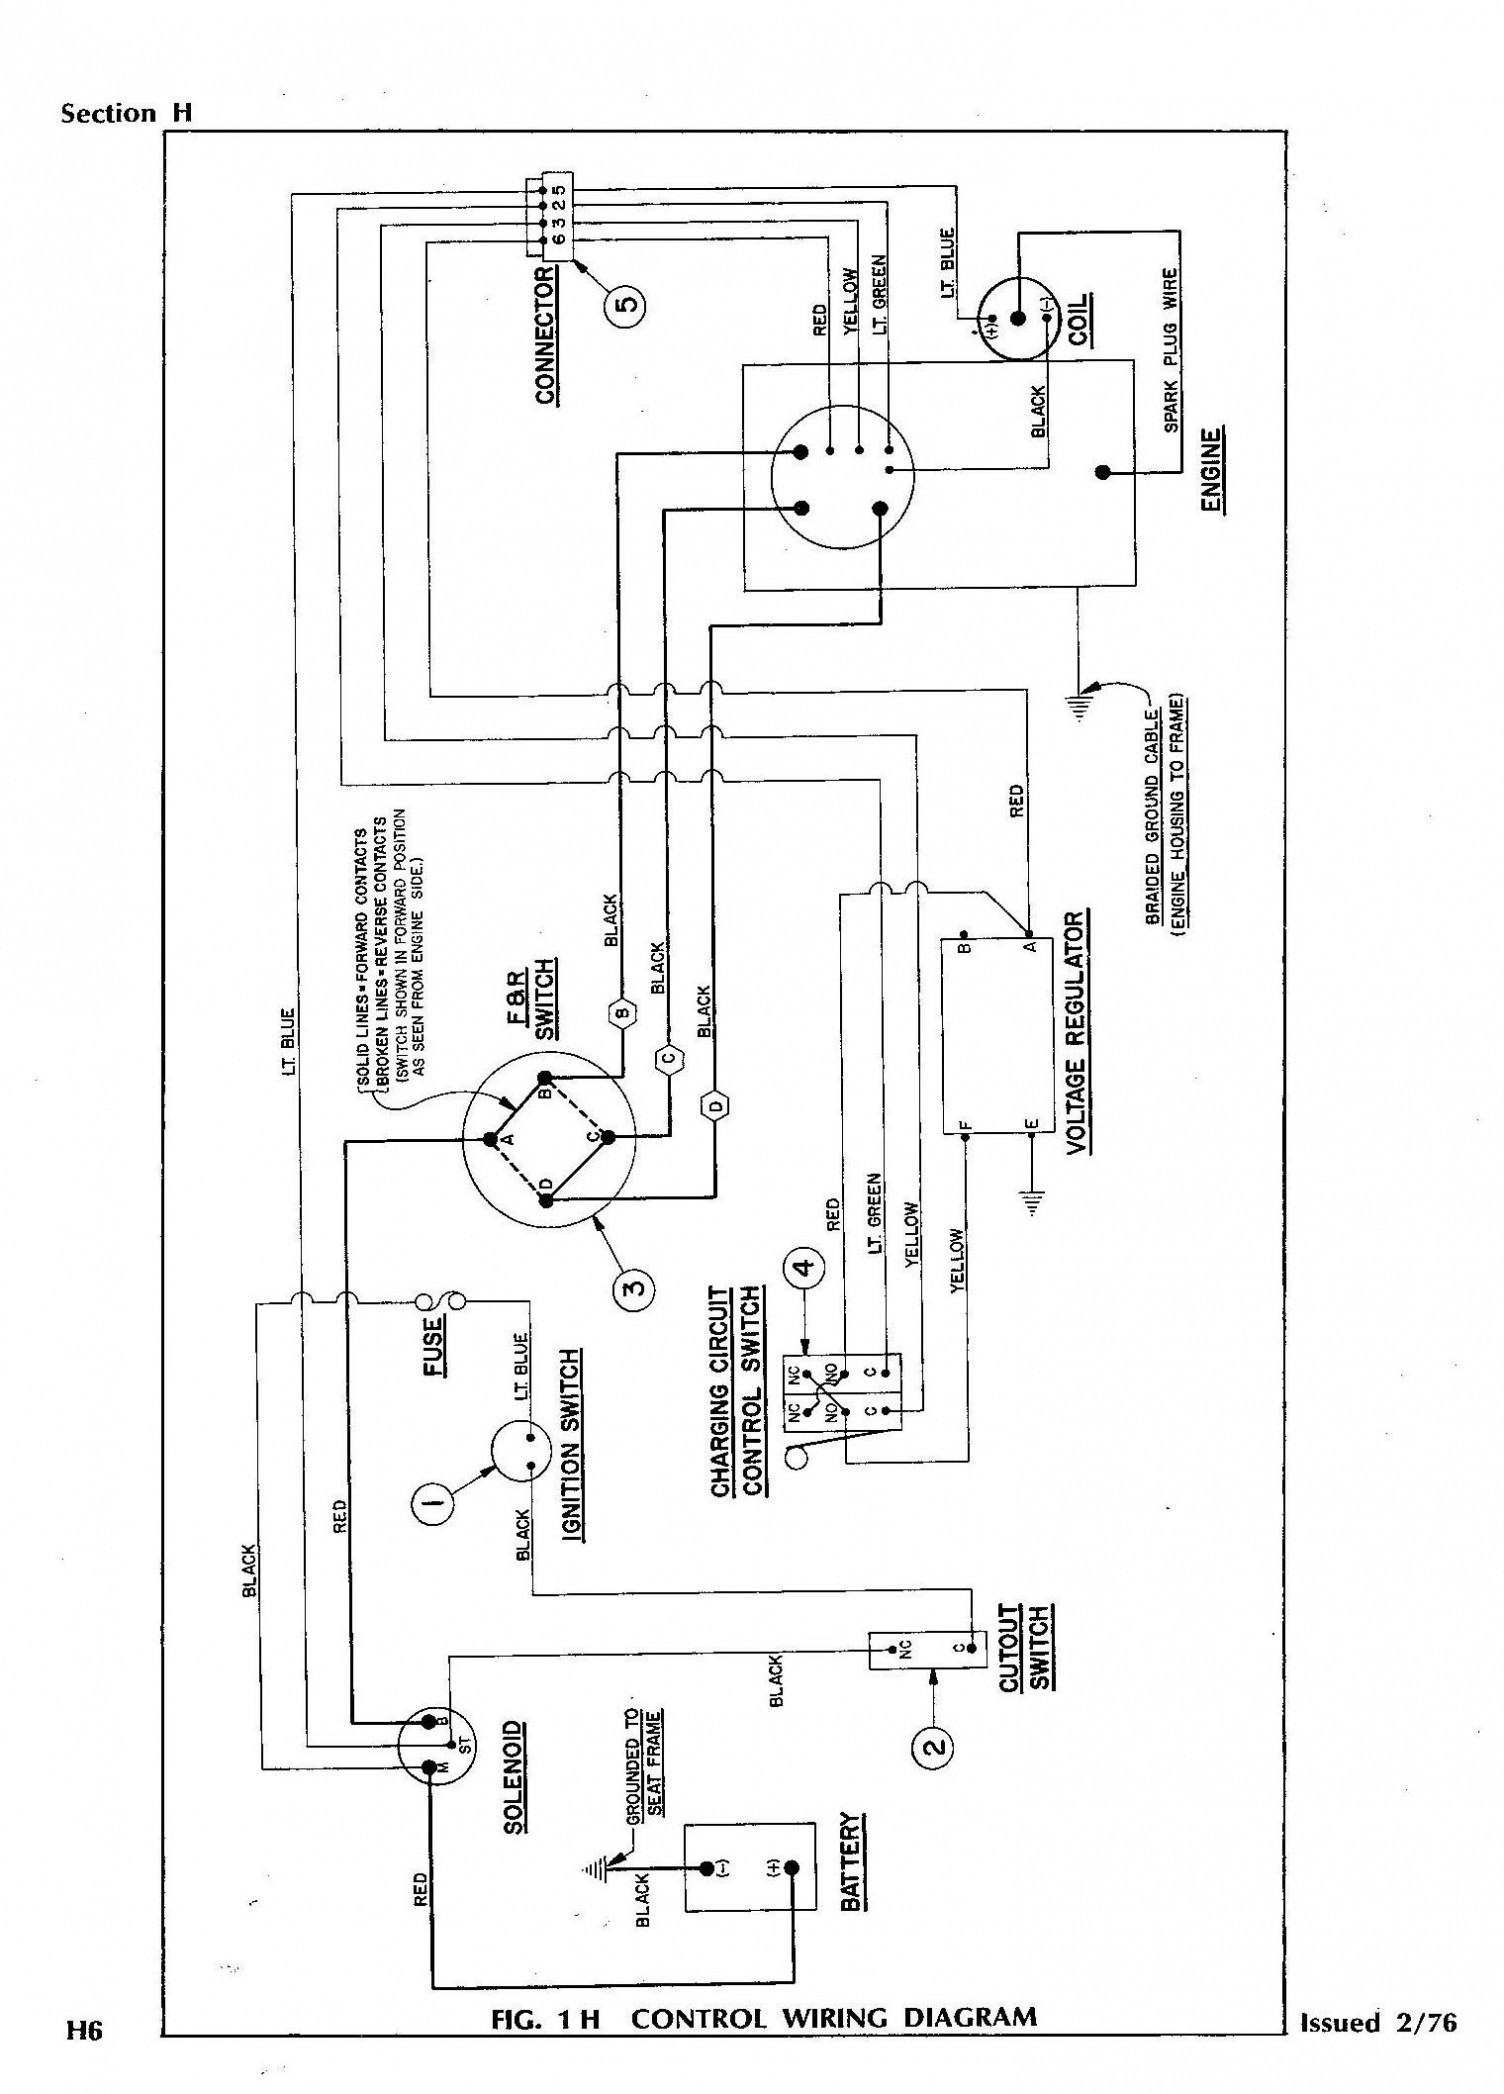 Wireing Diagram for 1988 Club Car Ds 6087] 36 Volt Club Car Wiring Diagram Schematic